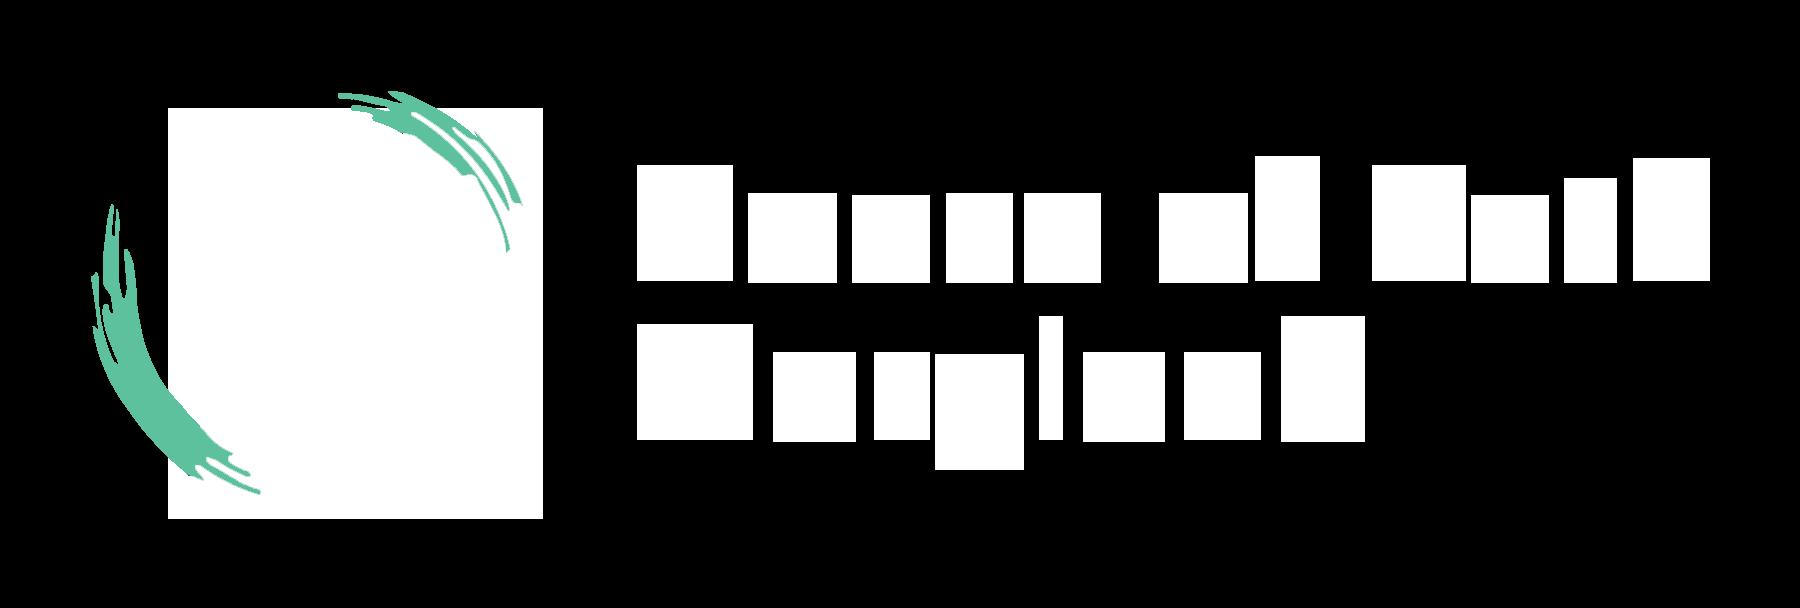 HRM_Logo_Horizontal_White-Teal